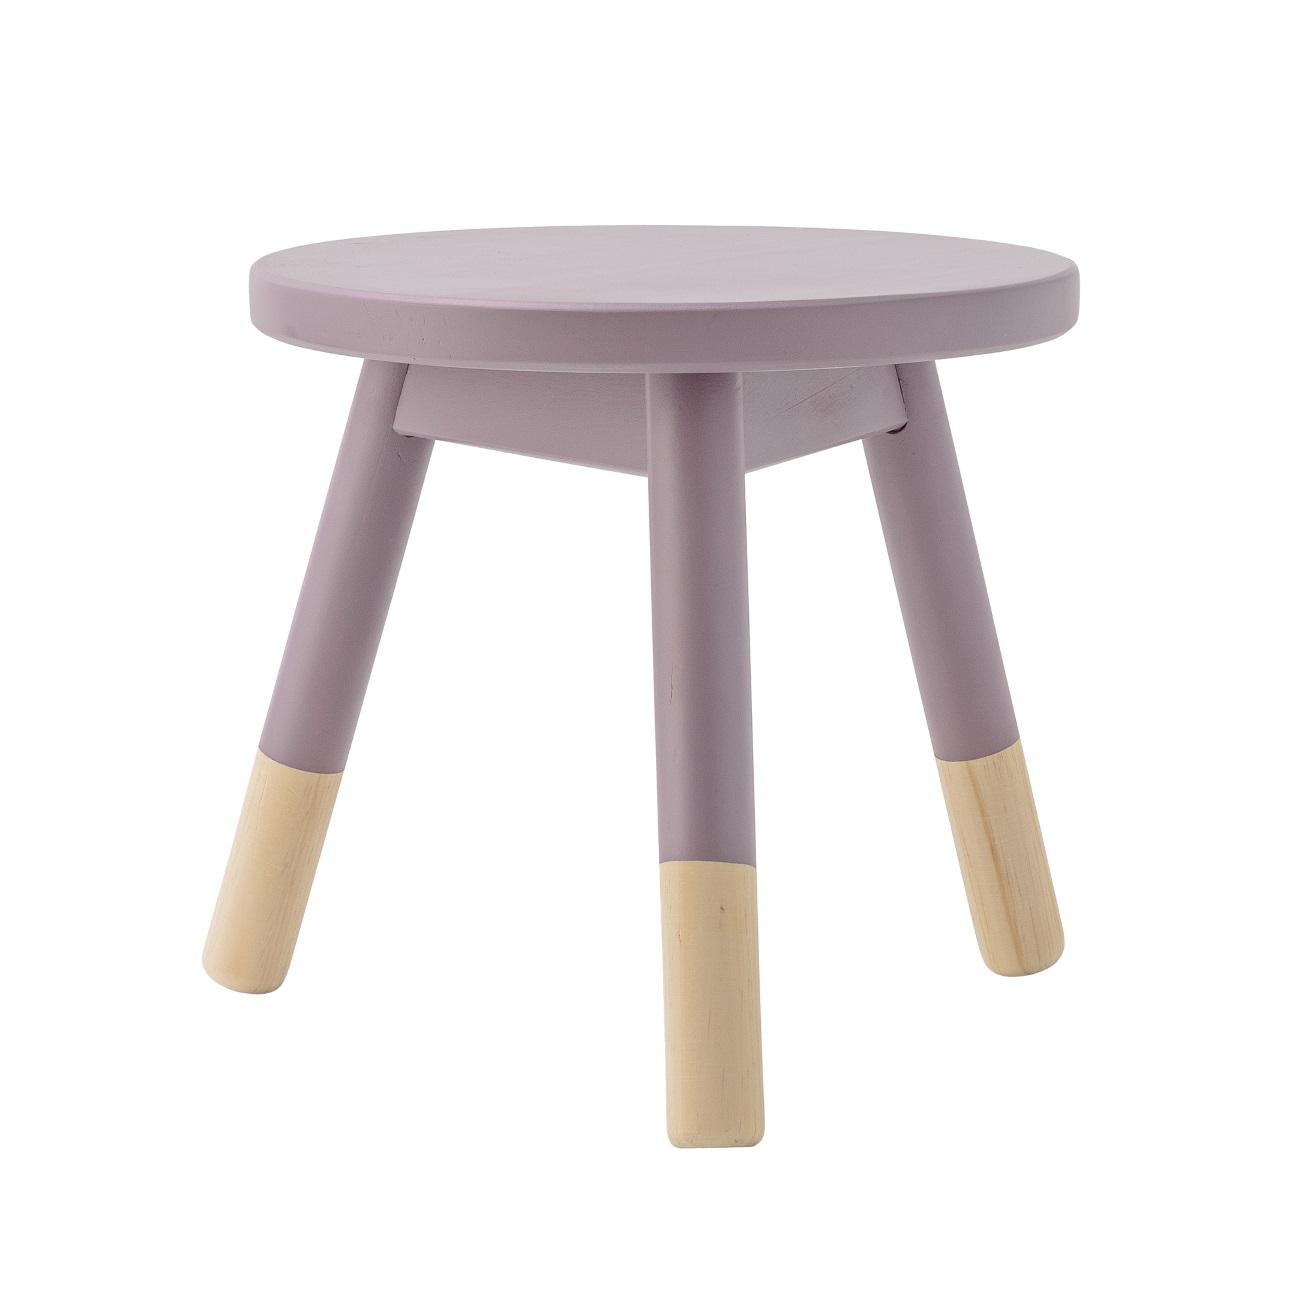 Barnpall Moon Purple Ø30xH30 cm Bloomingville Mini